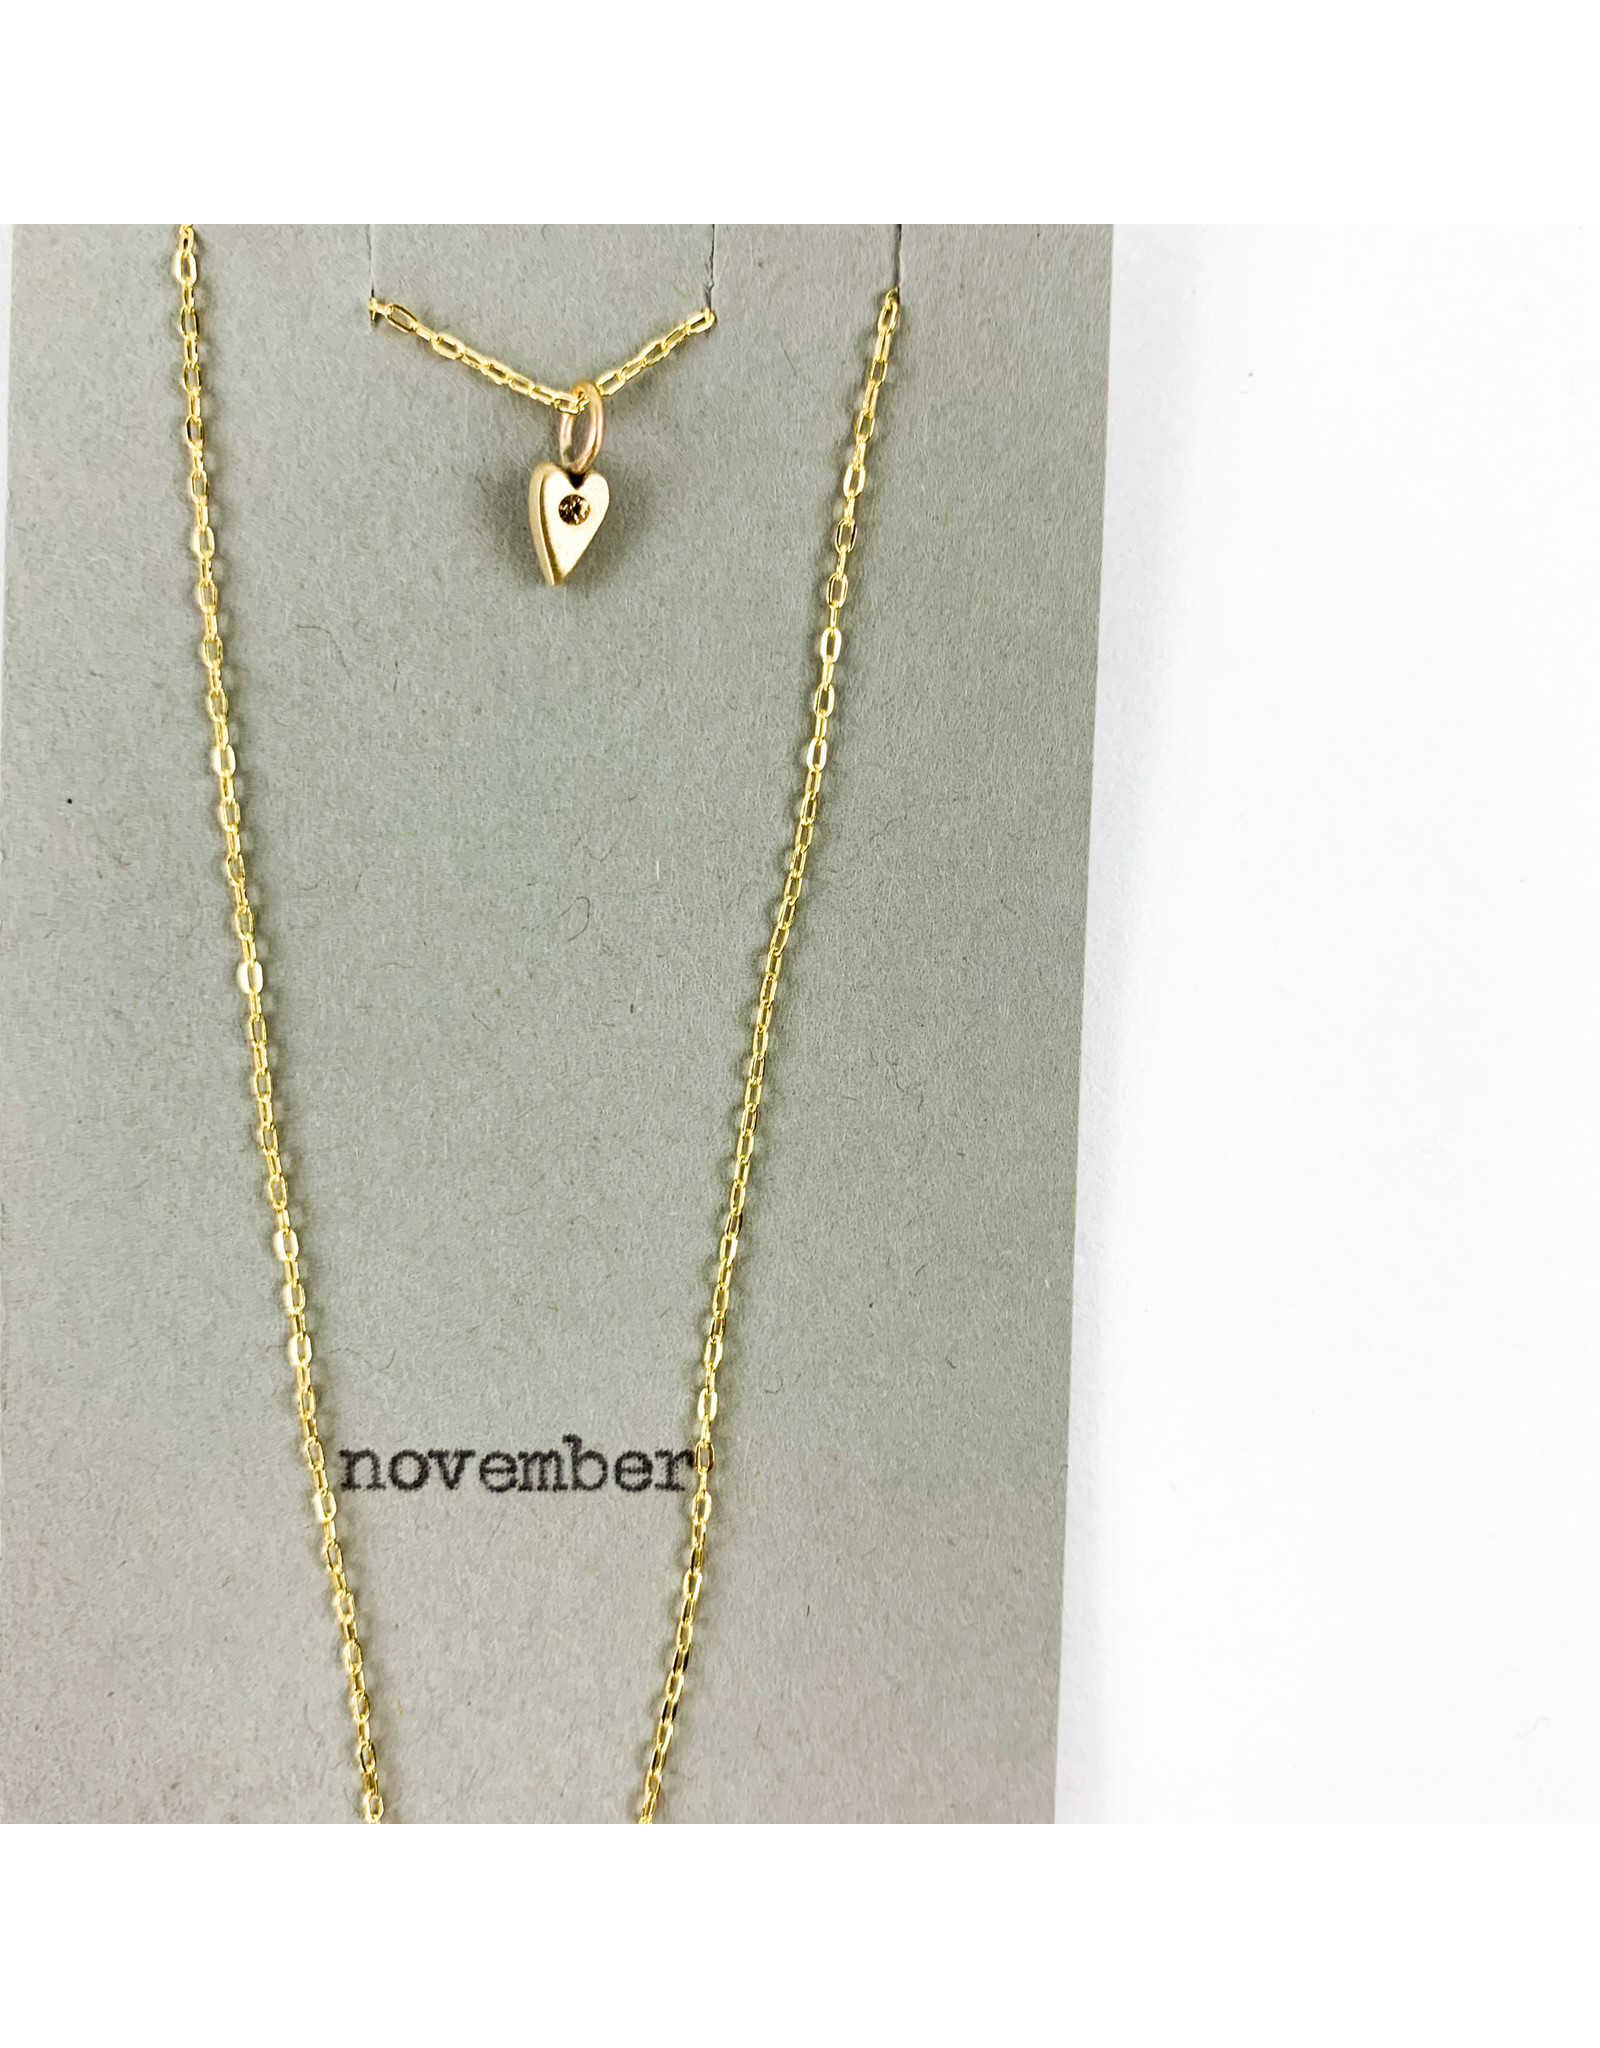 penny larsen November Necklace/ Topaz Gold Chain